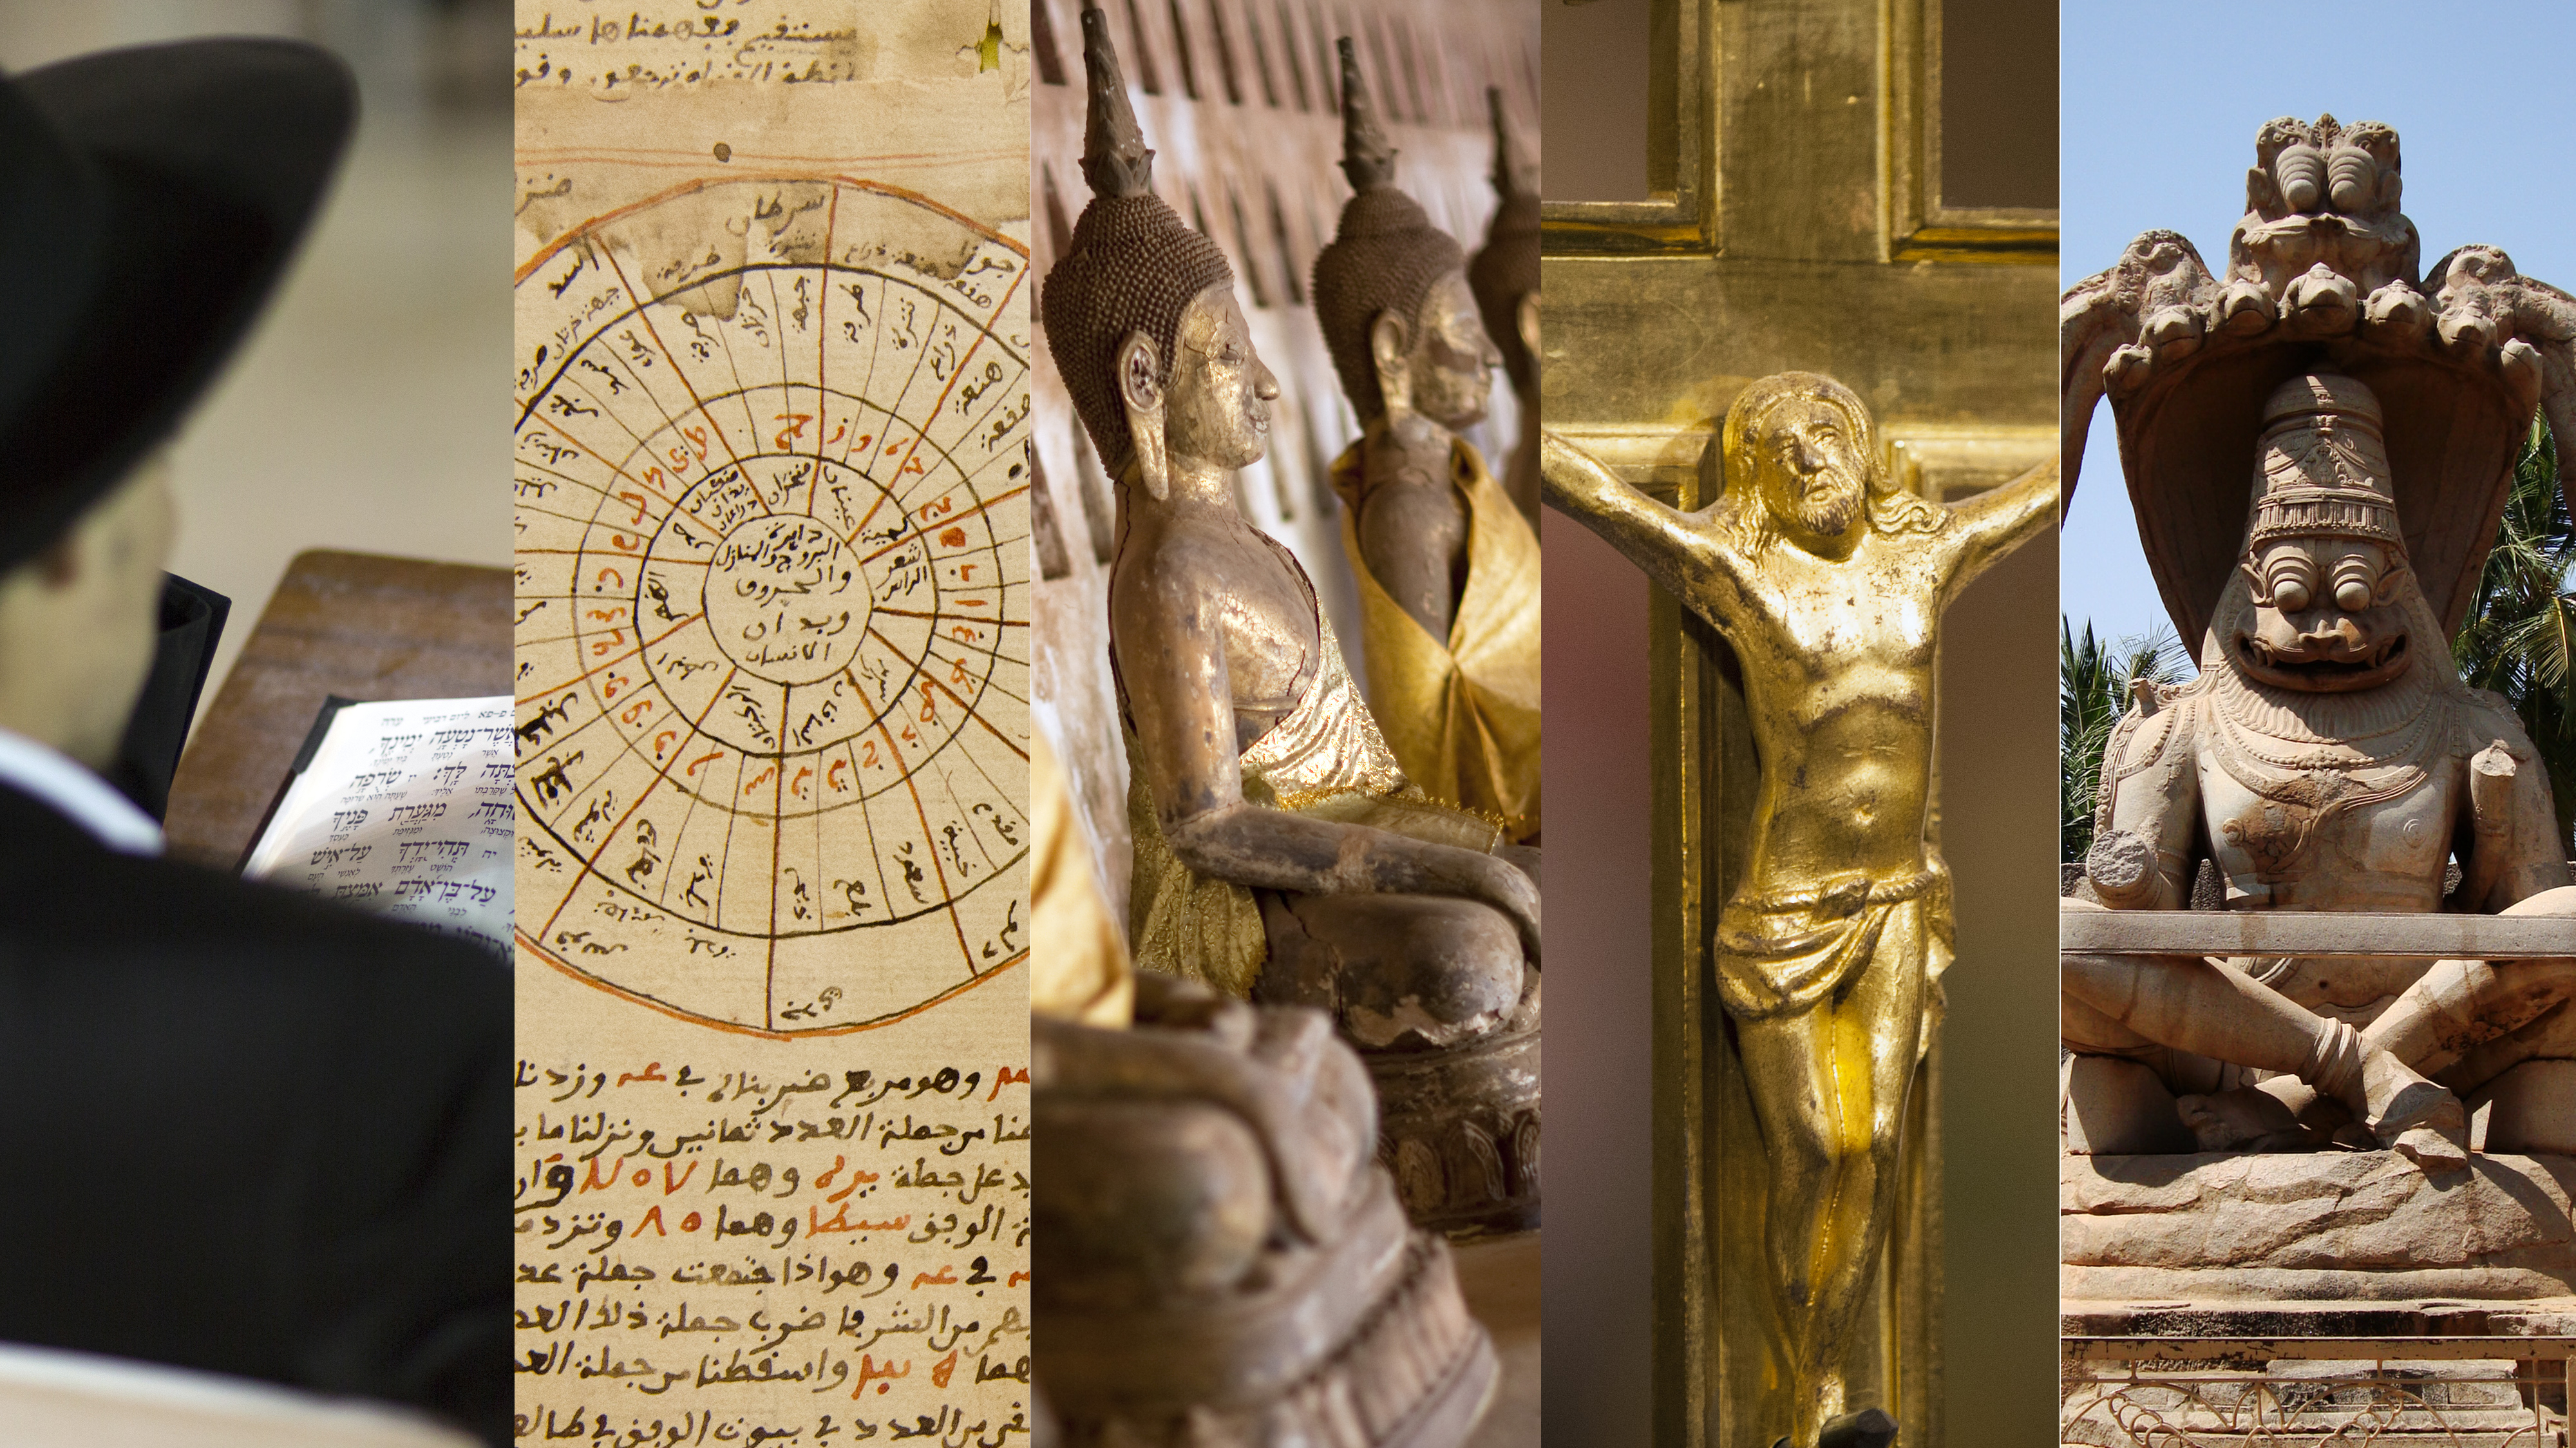 Weltreligionen: Judentum, Islam, Buddhismus, Christentum, Hinduismus